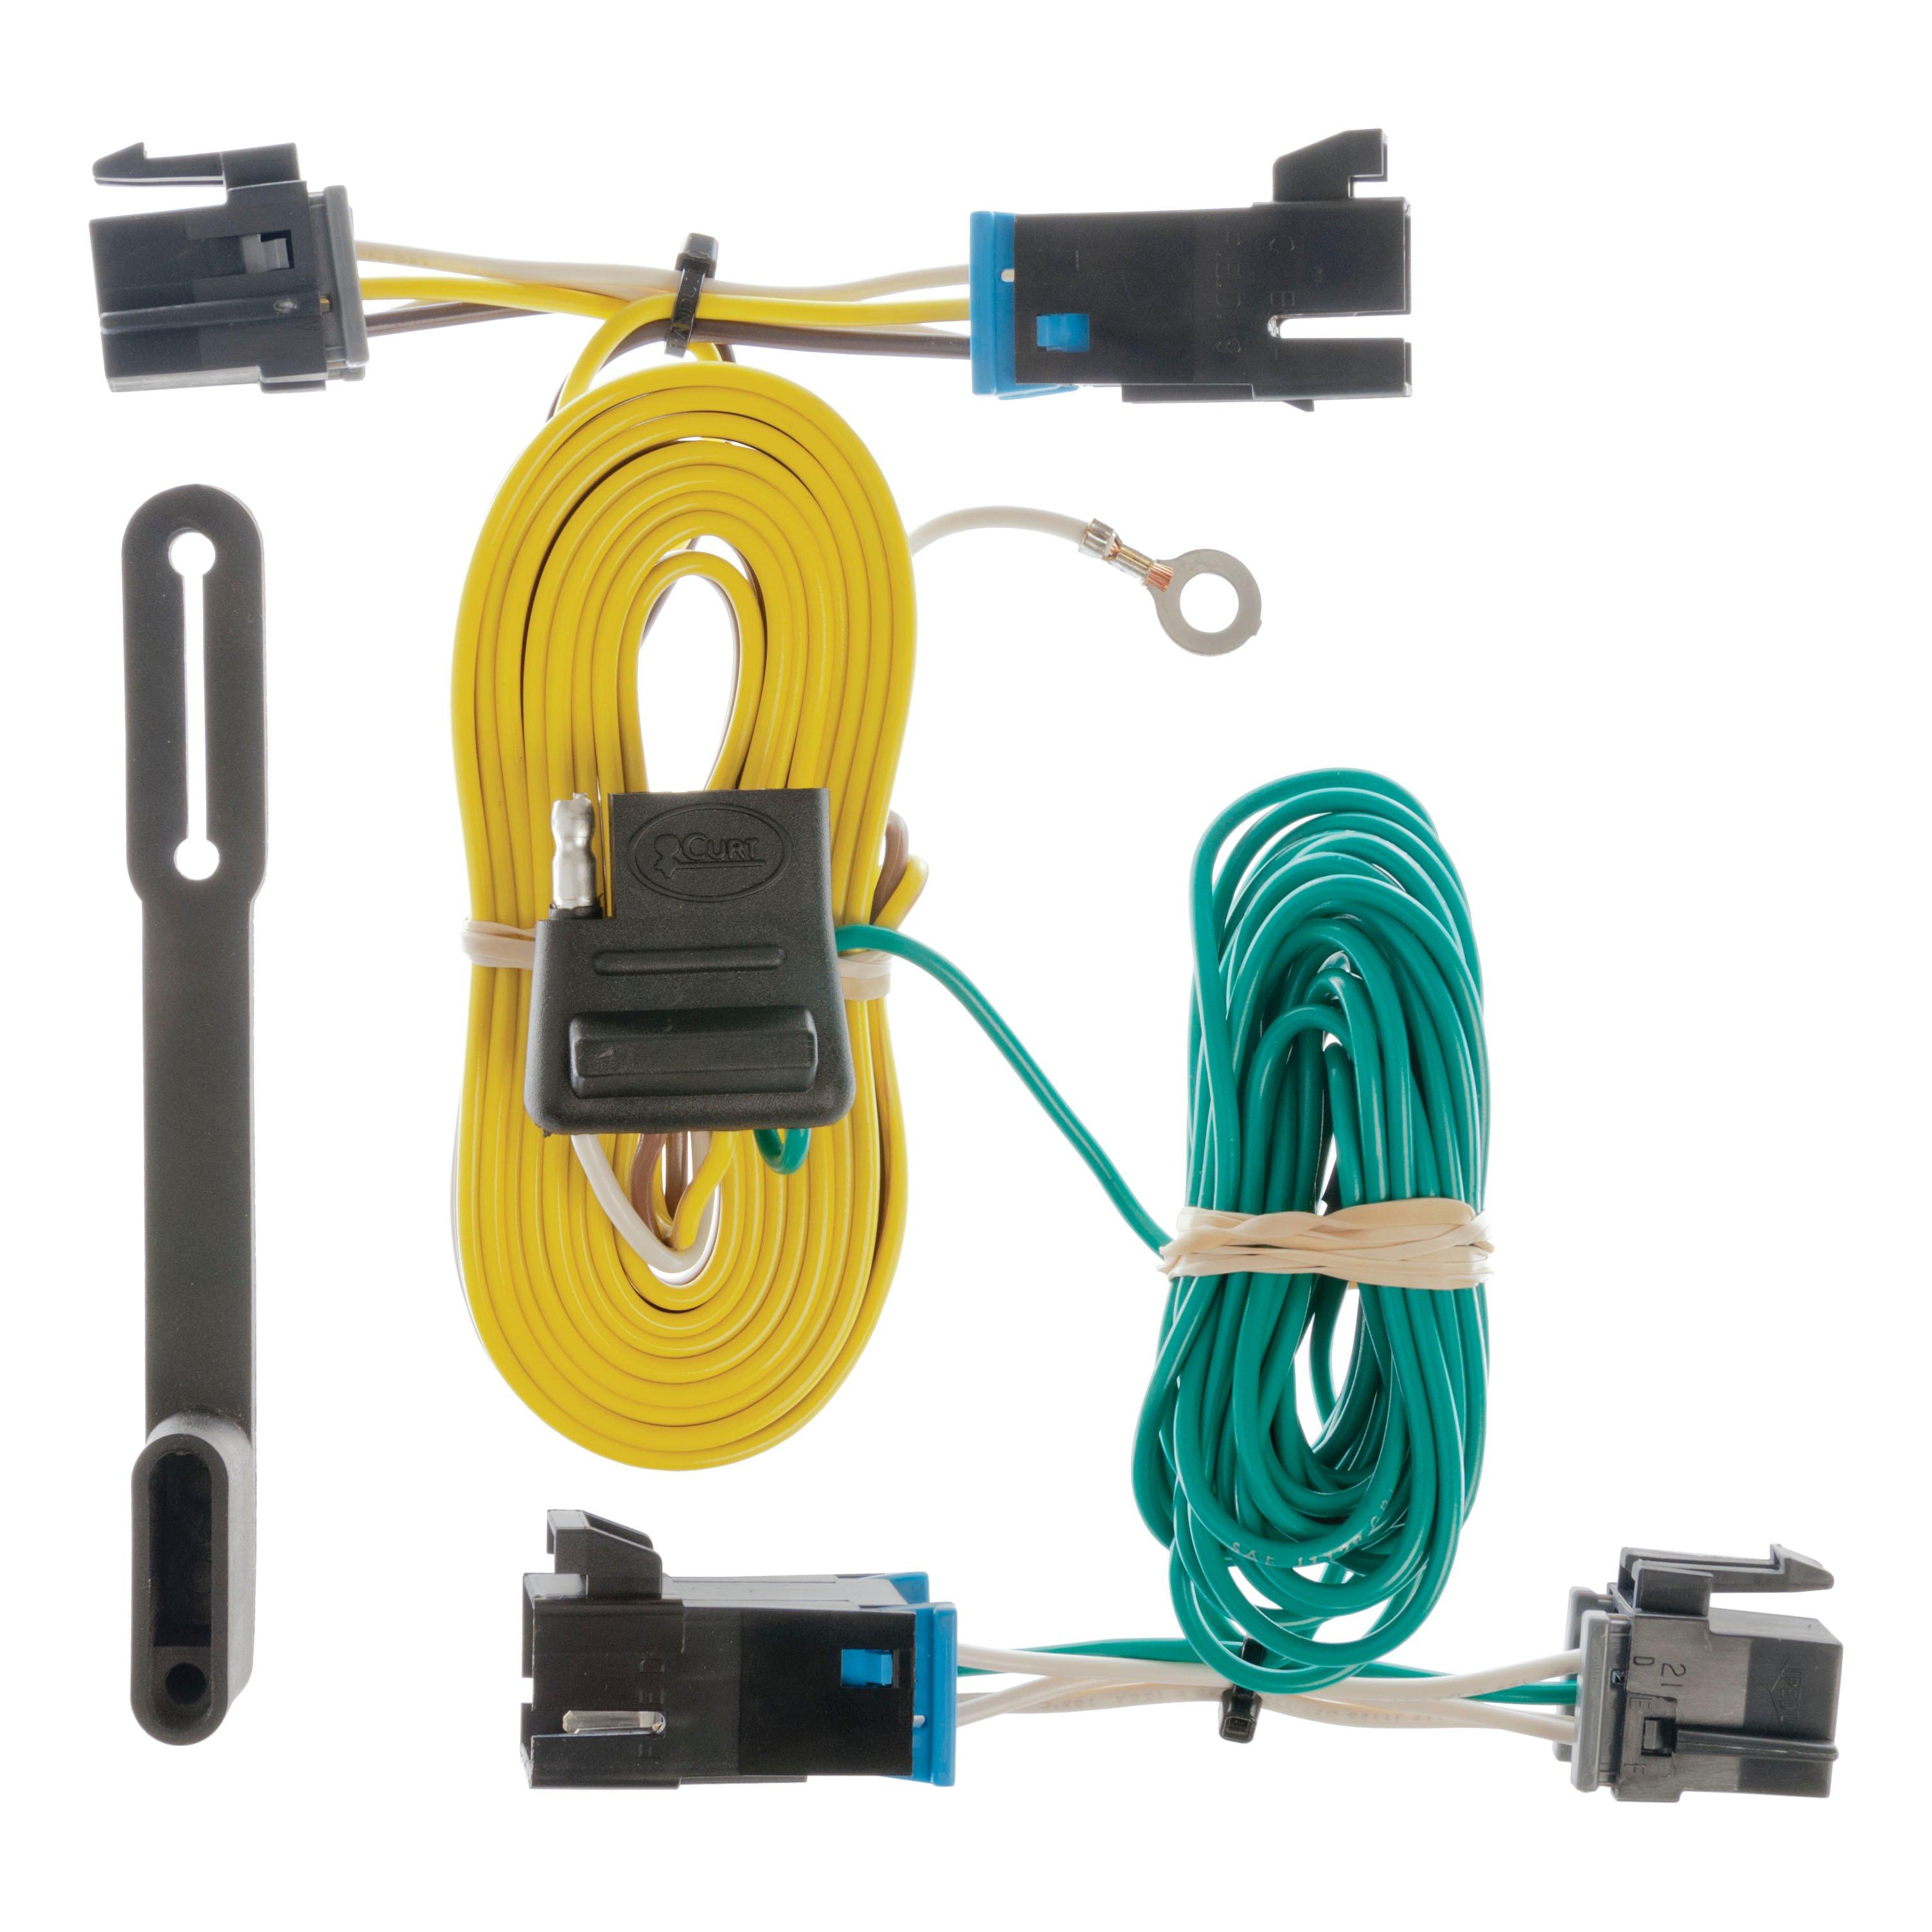 curt 55540 vehicle to trailer wiring harness for chevrolet express gmc savana ebay